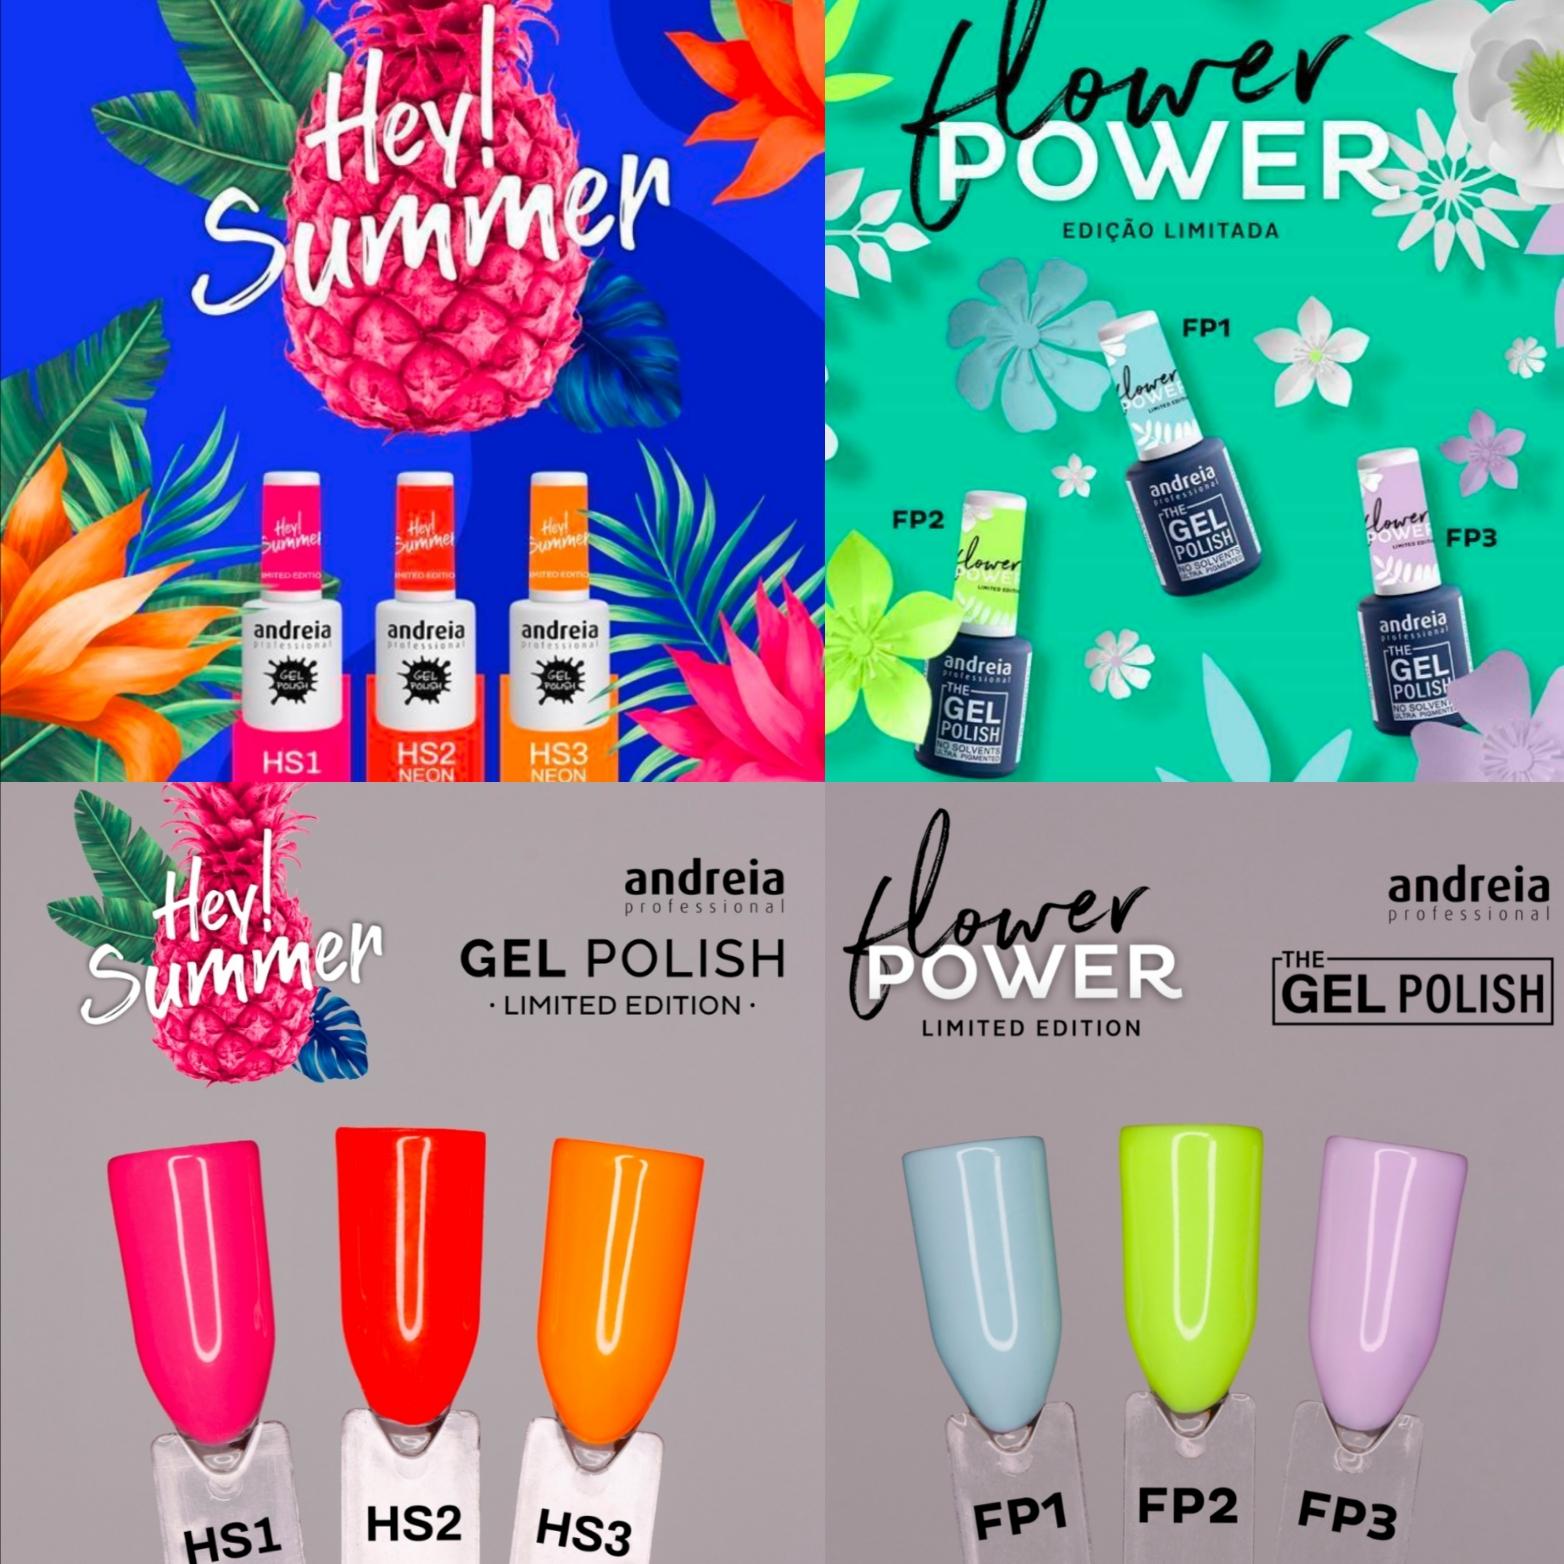 VERNIZ GEL ANDREIA - HEY SUMMER & FLOWER POWER